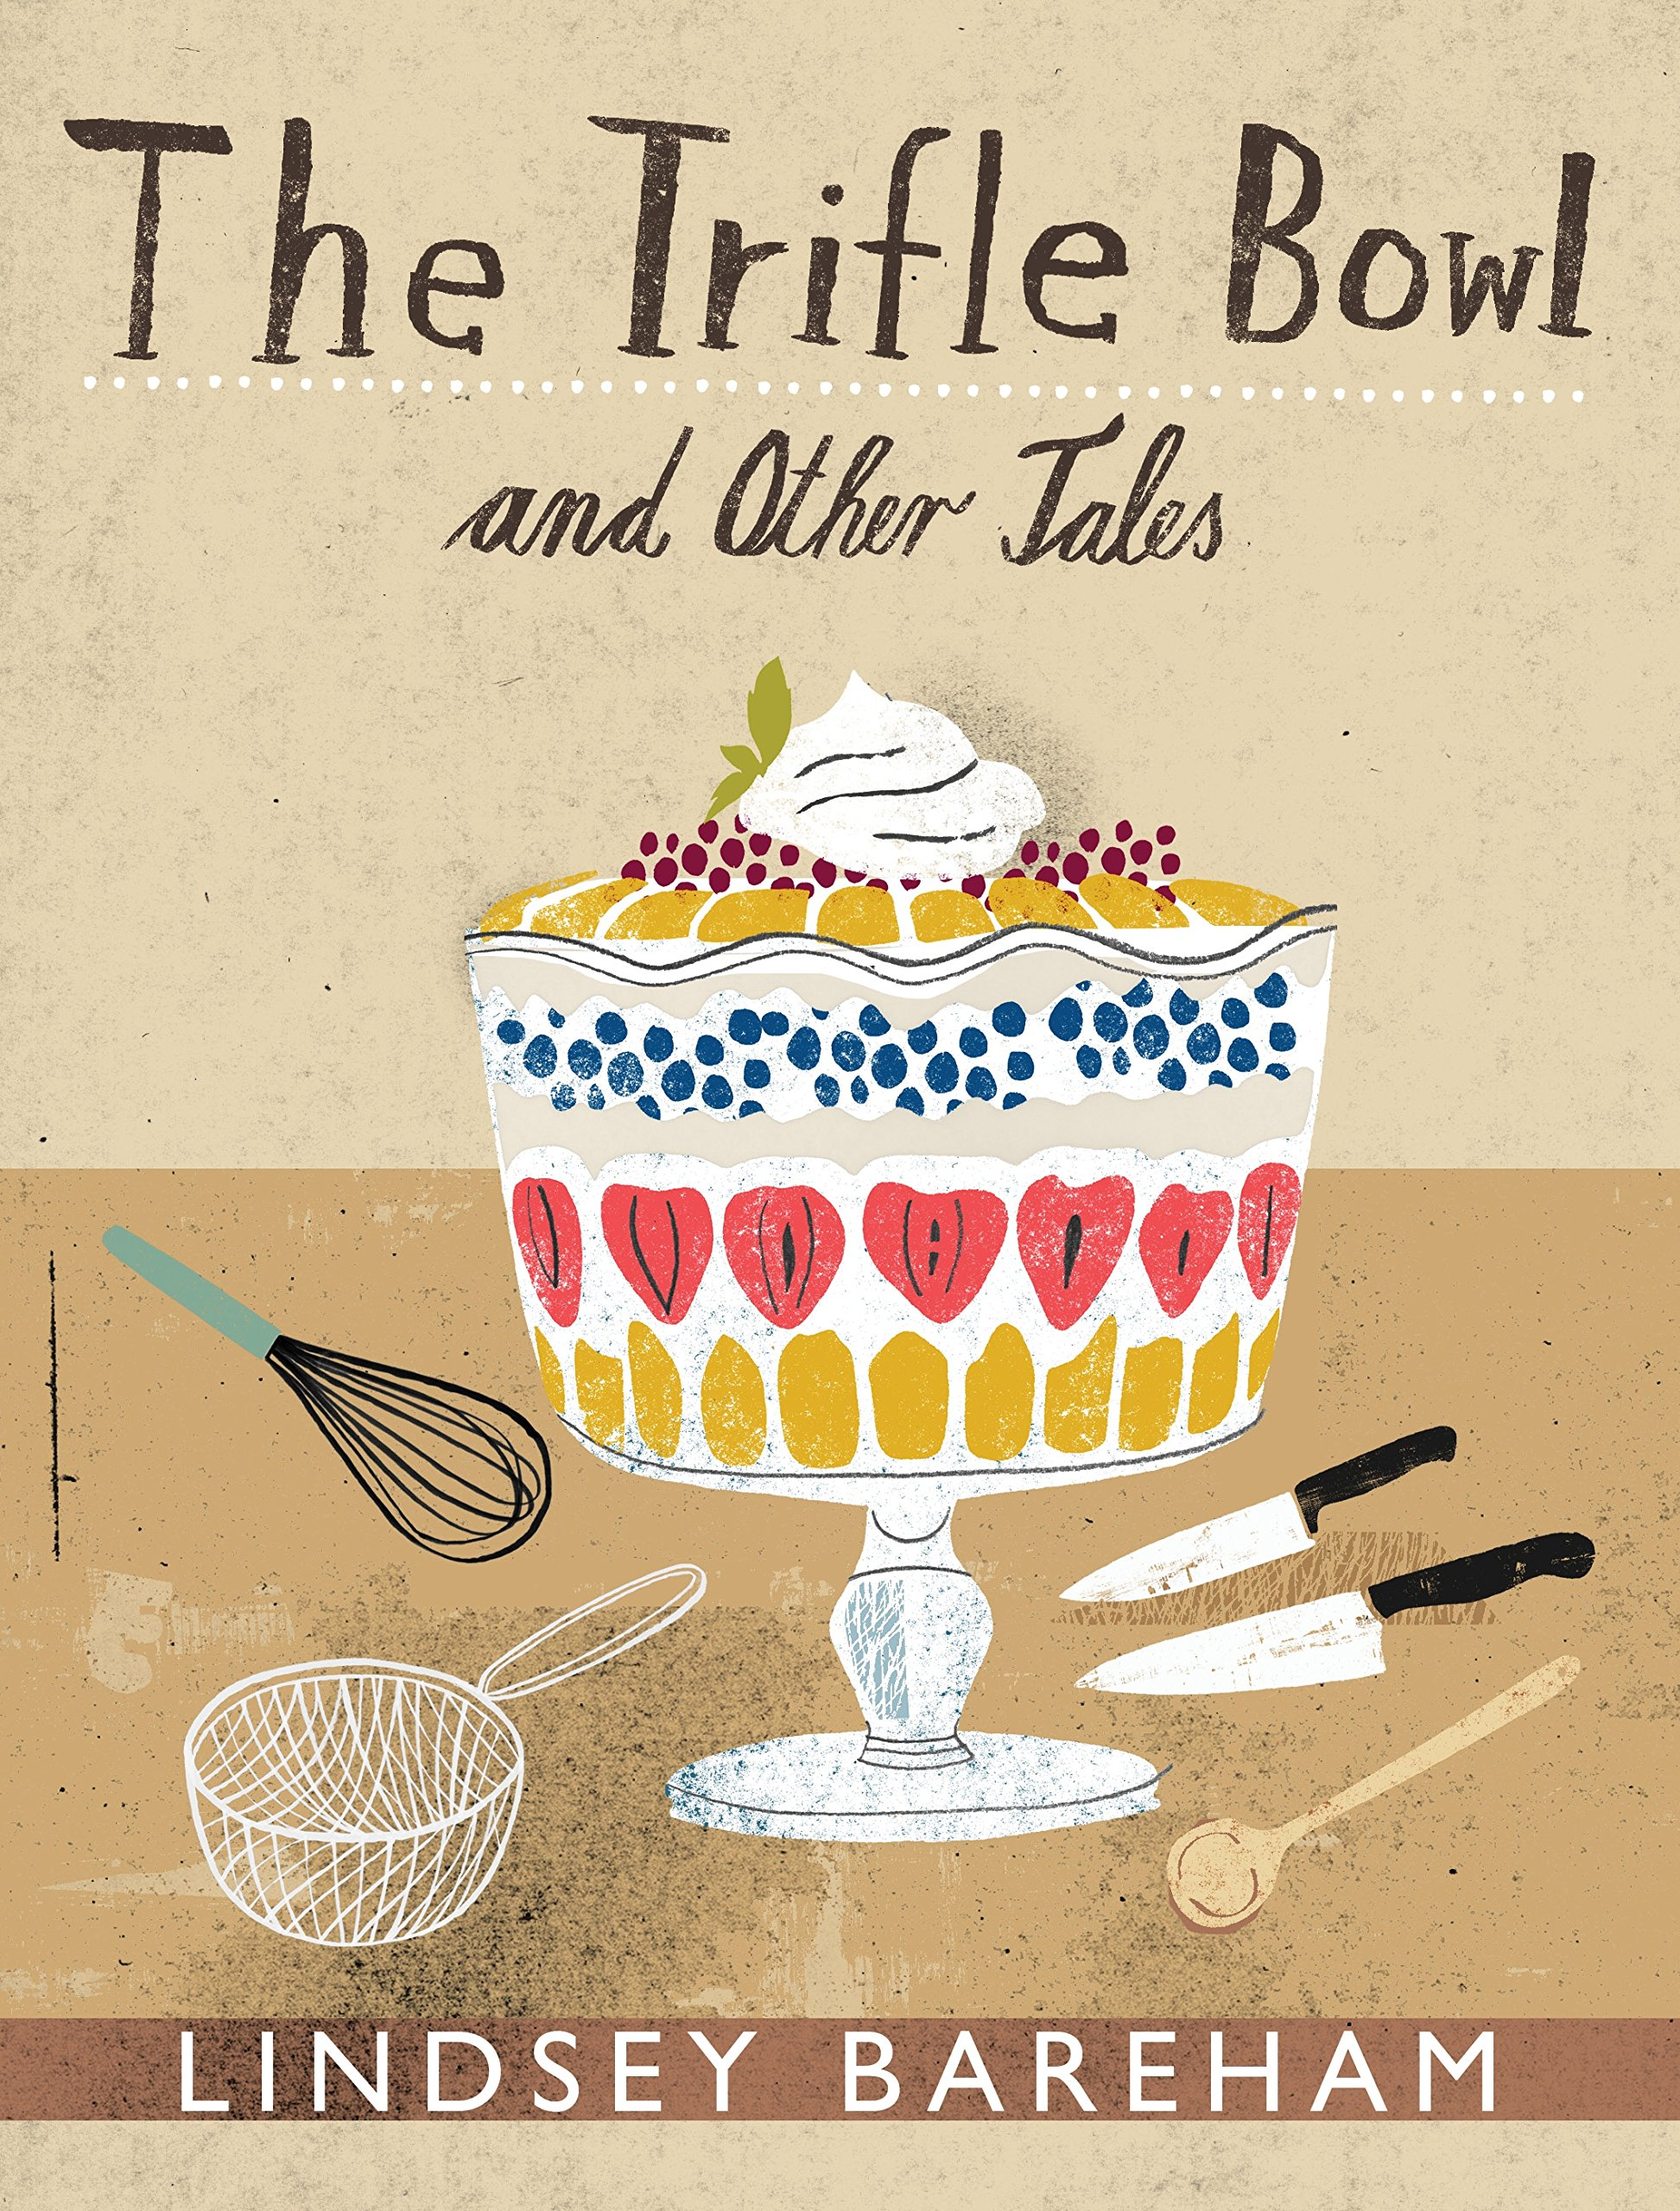 The Trifle Bowl Lindsey Bareham 9780593069417 Amazon Com Books